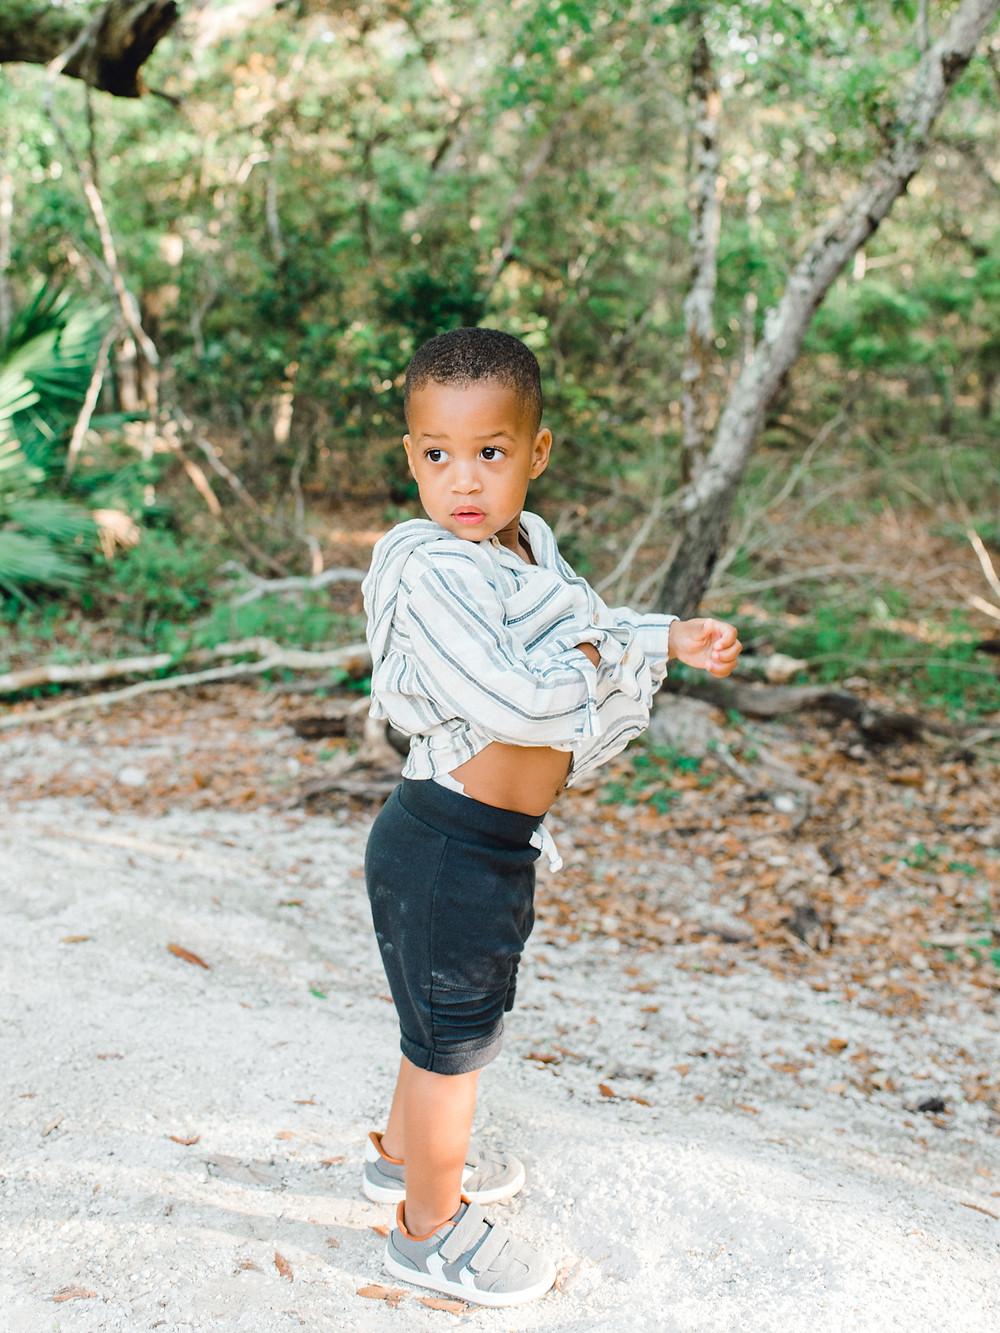 2 year old milestone portaits | family, newborn, maternity photographer | ponte vedra, jacksonville, jax, nocatee, saint augustine florida